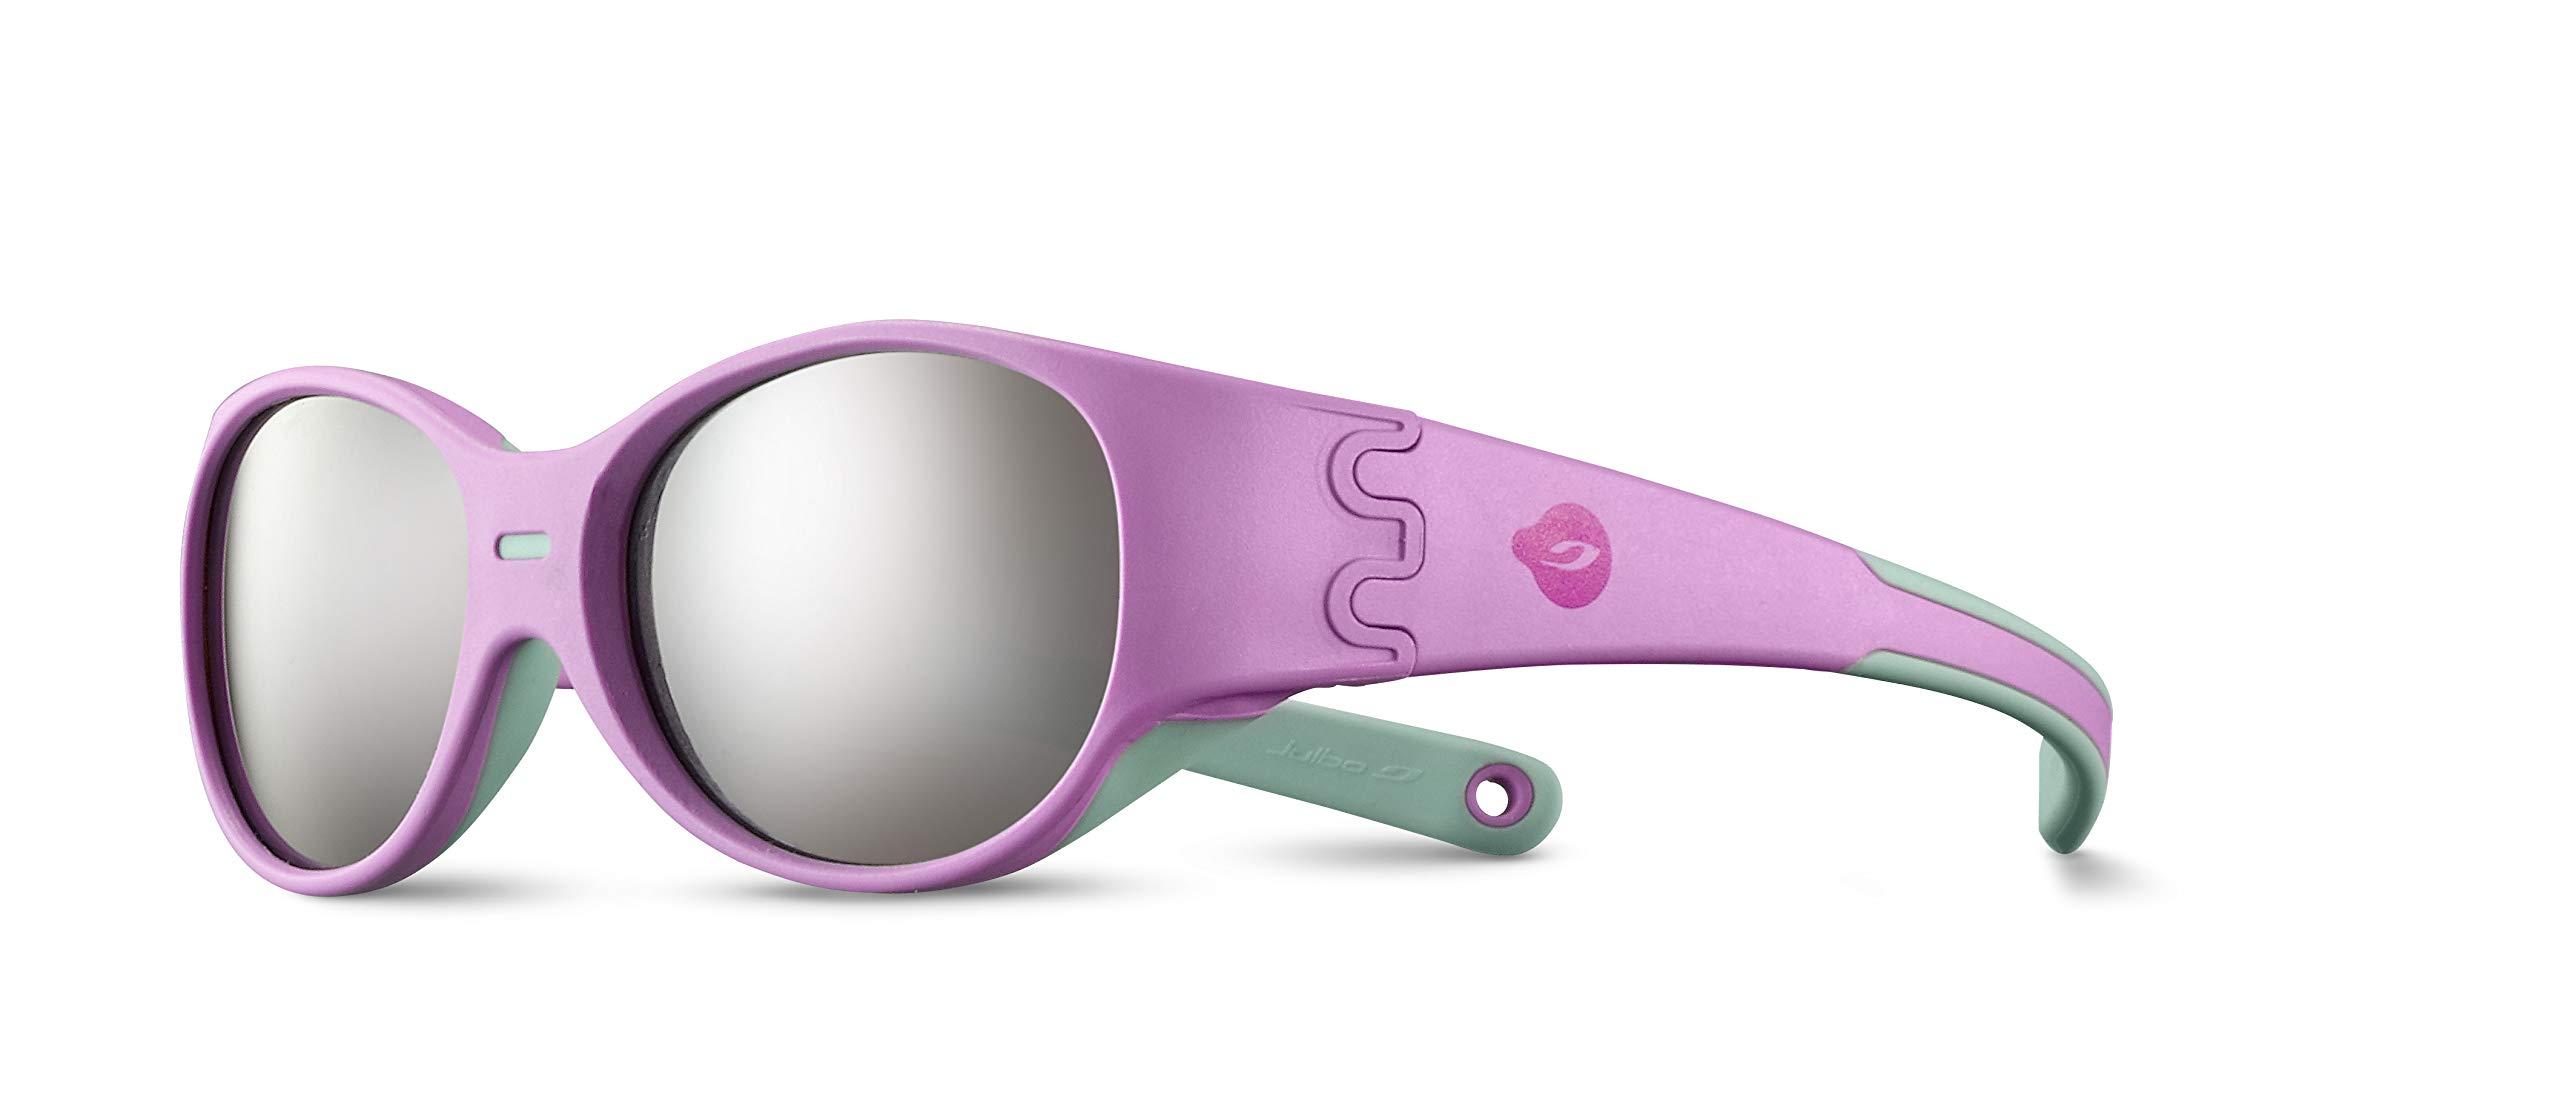 Julbo Domino Junior Sunglasses - Spectron 4 Baby - Pink/Blue Mint